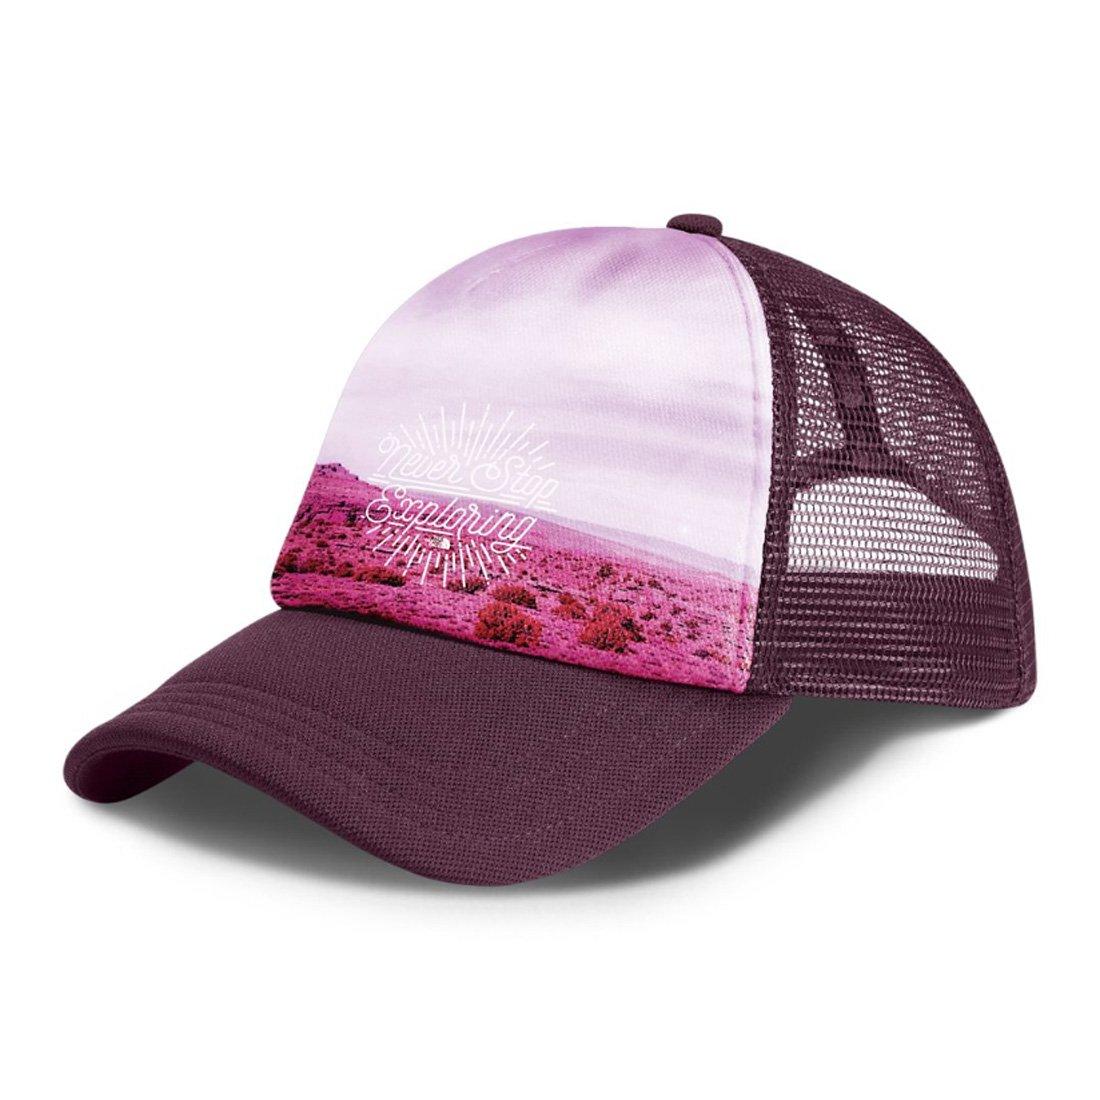 c9b872e2d289f Amazon.com  The North Face photobomb Hat